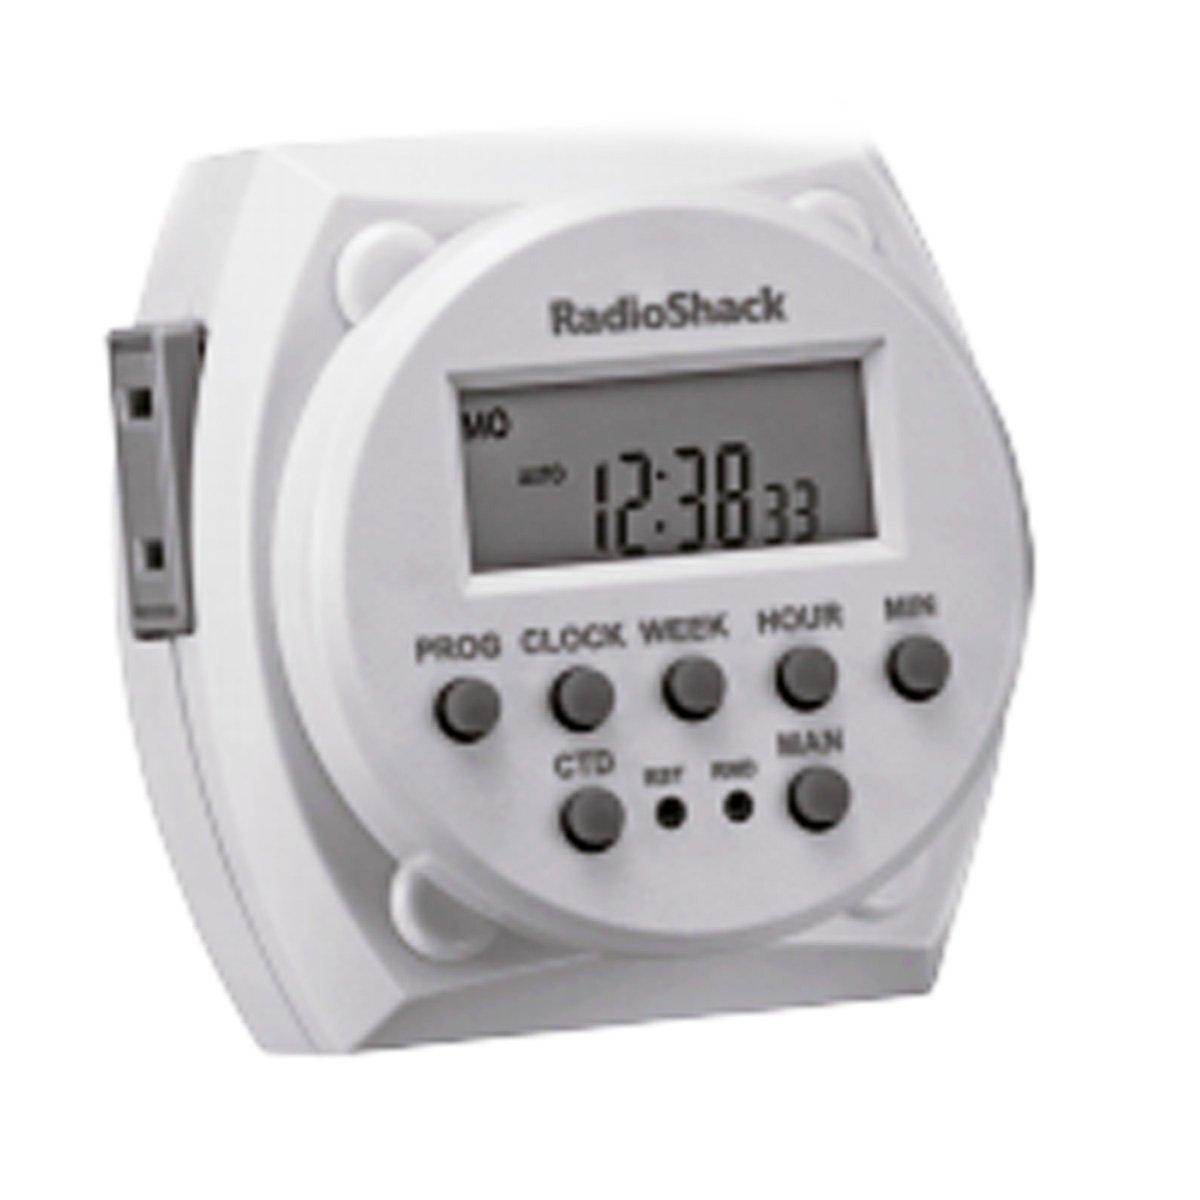 RadioShack® Digital Lamp Timer - Electrical Timers - Amazon.com